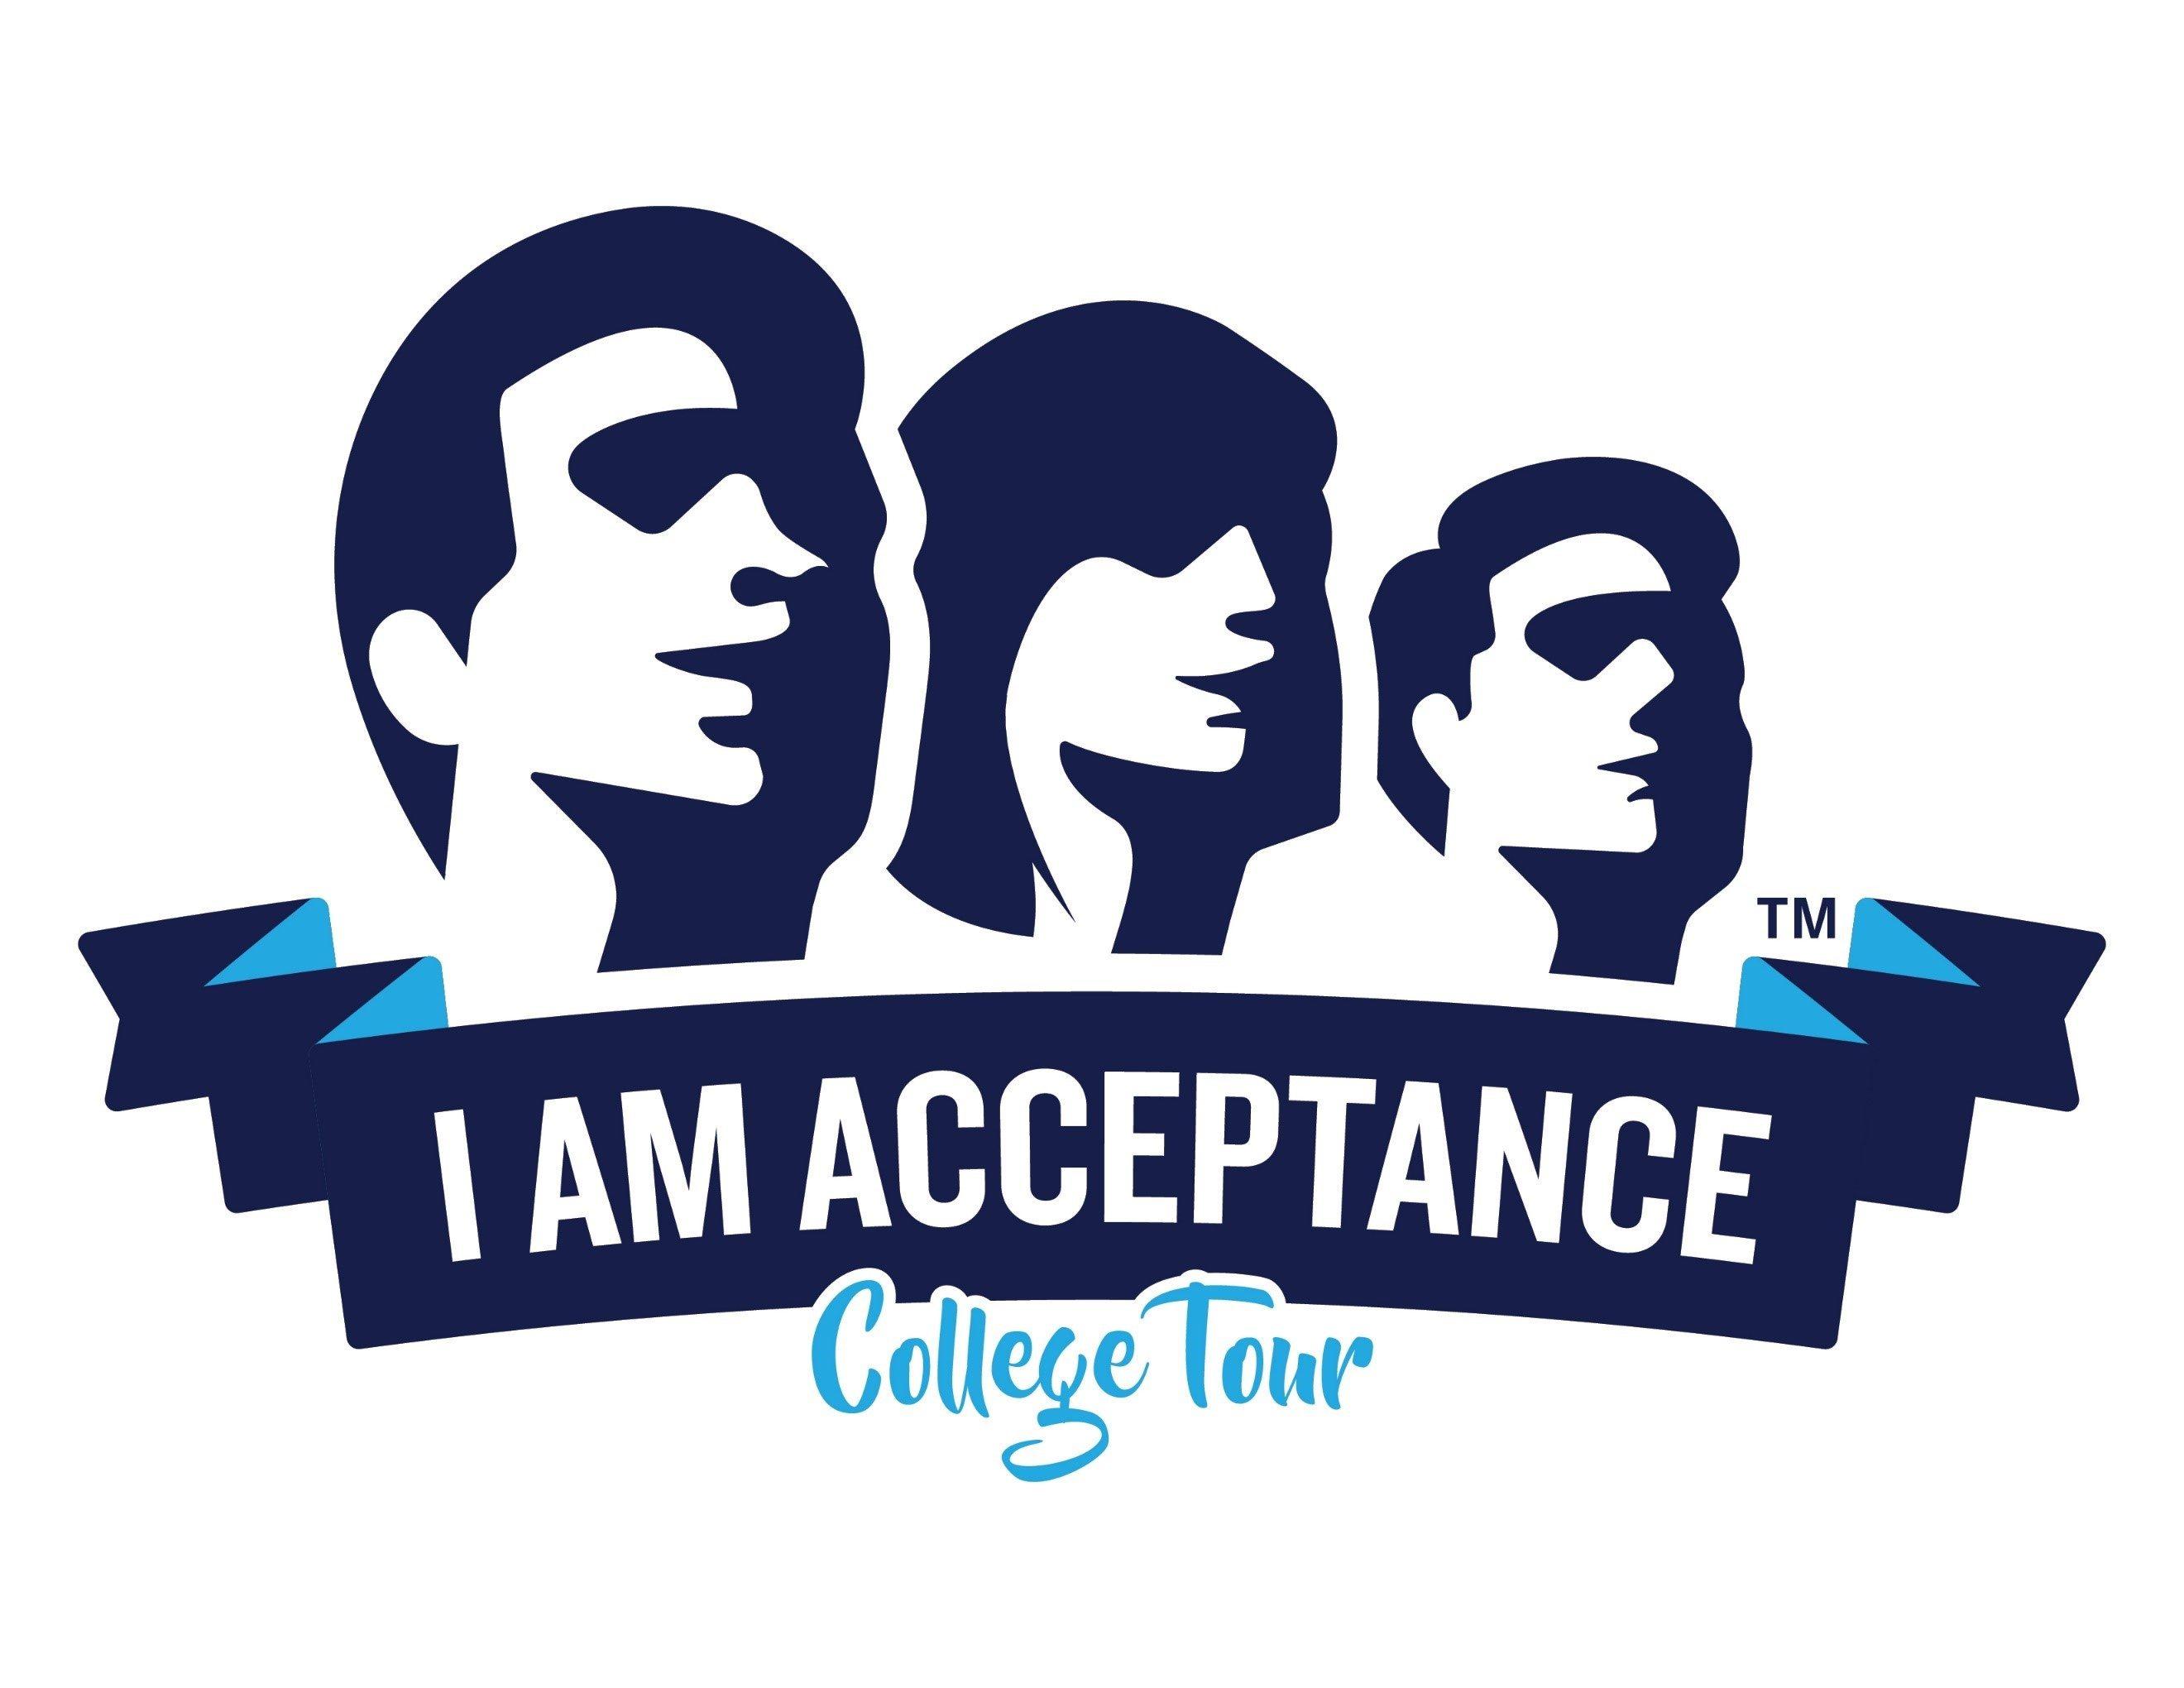 IAmAcceptance_logo_CT (smaill) (1)